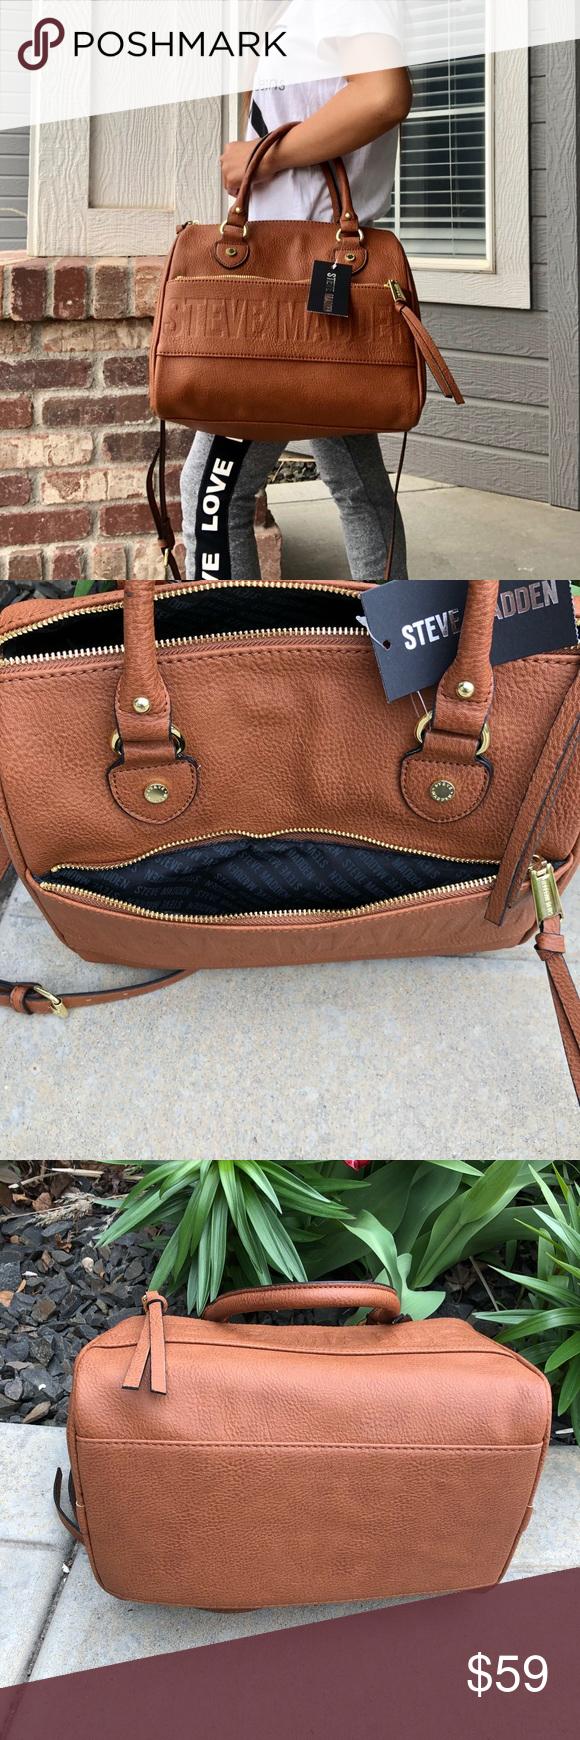 69a47a5df54 Steve Madden Cognac Bdex Handbag , Purse Brand new with tag Steve ...